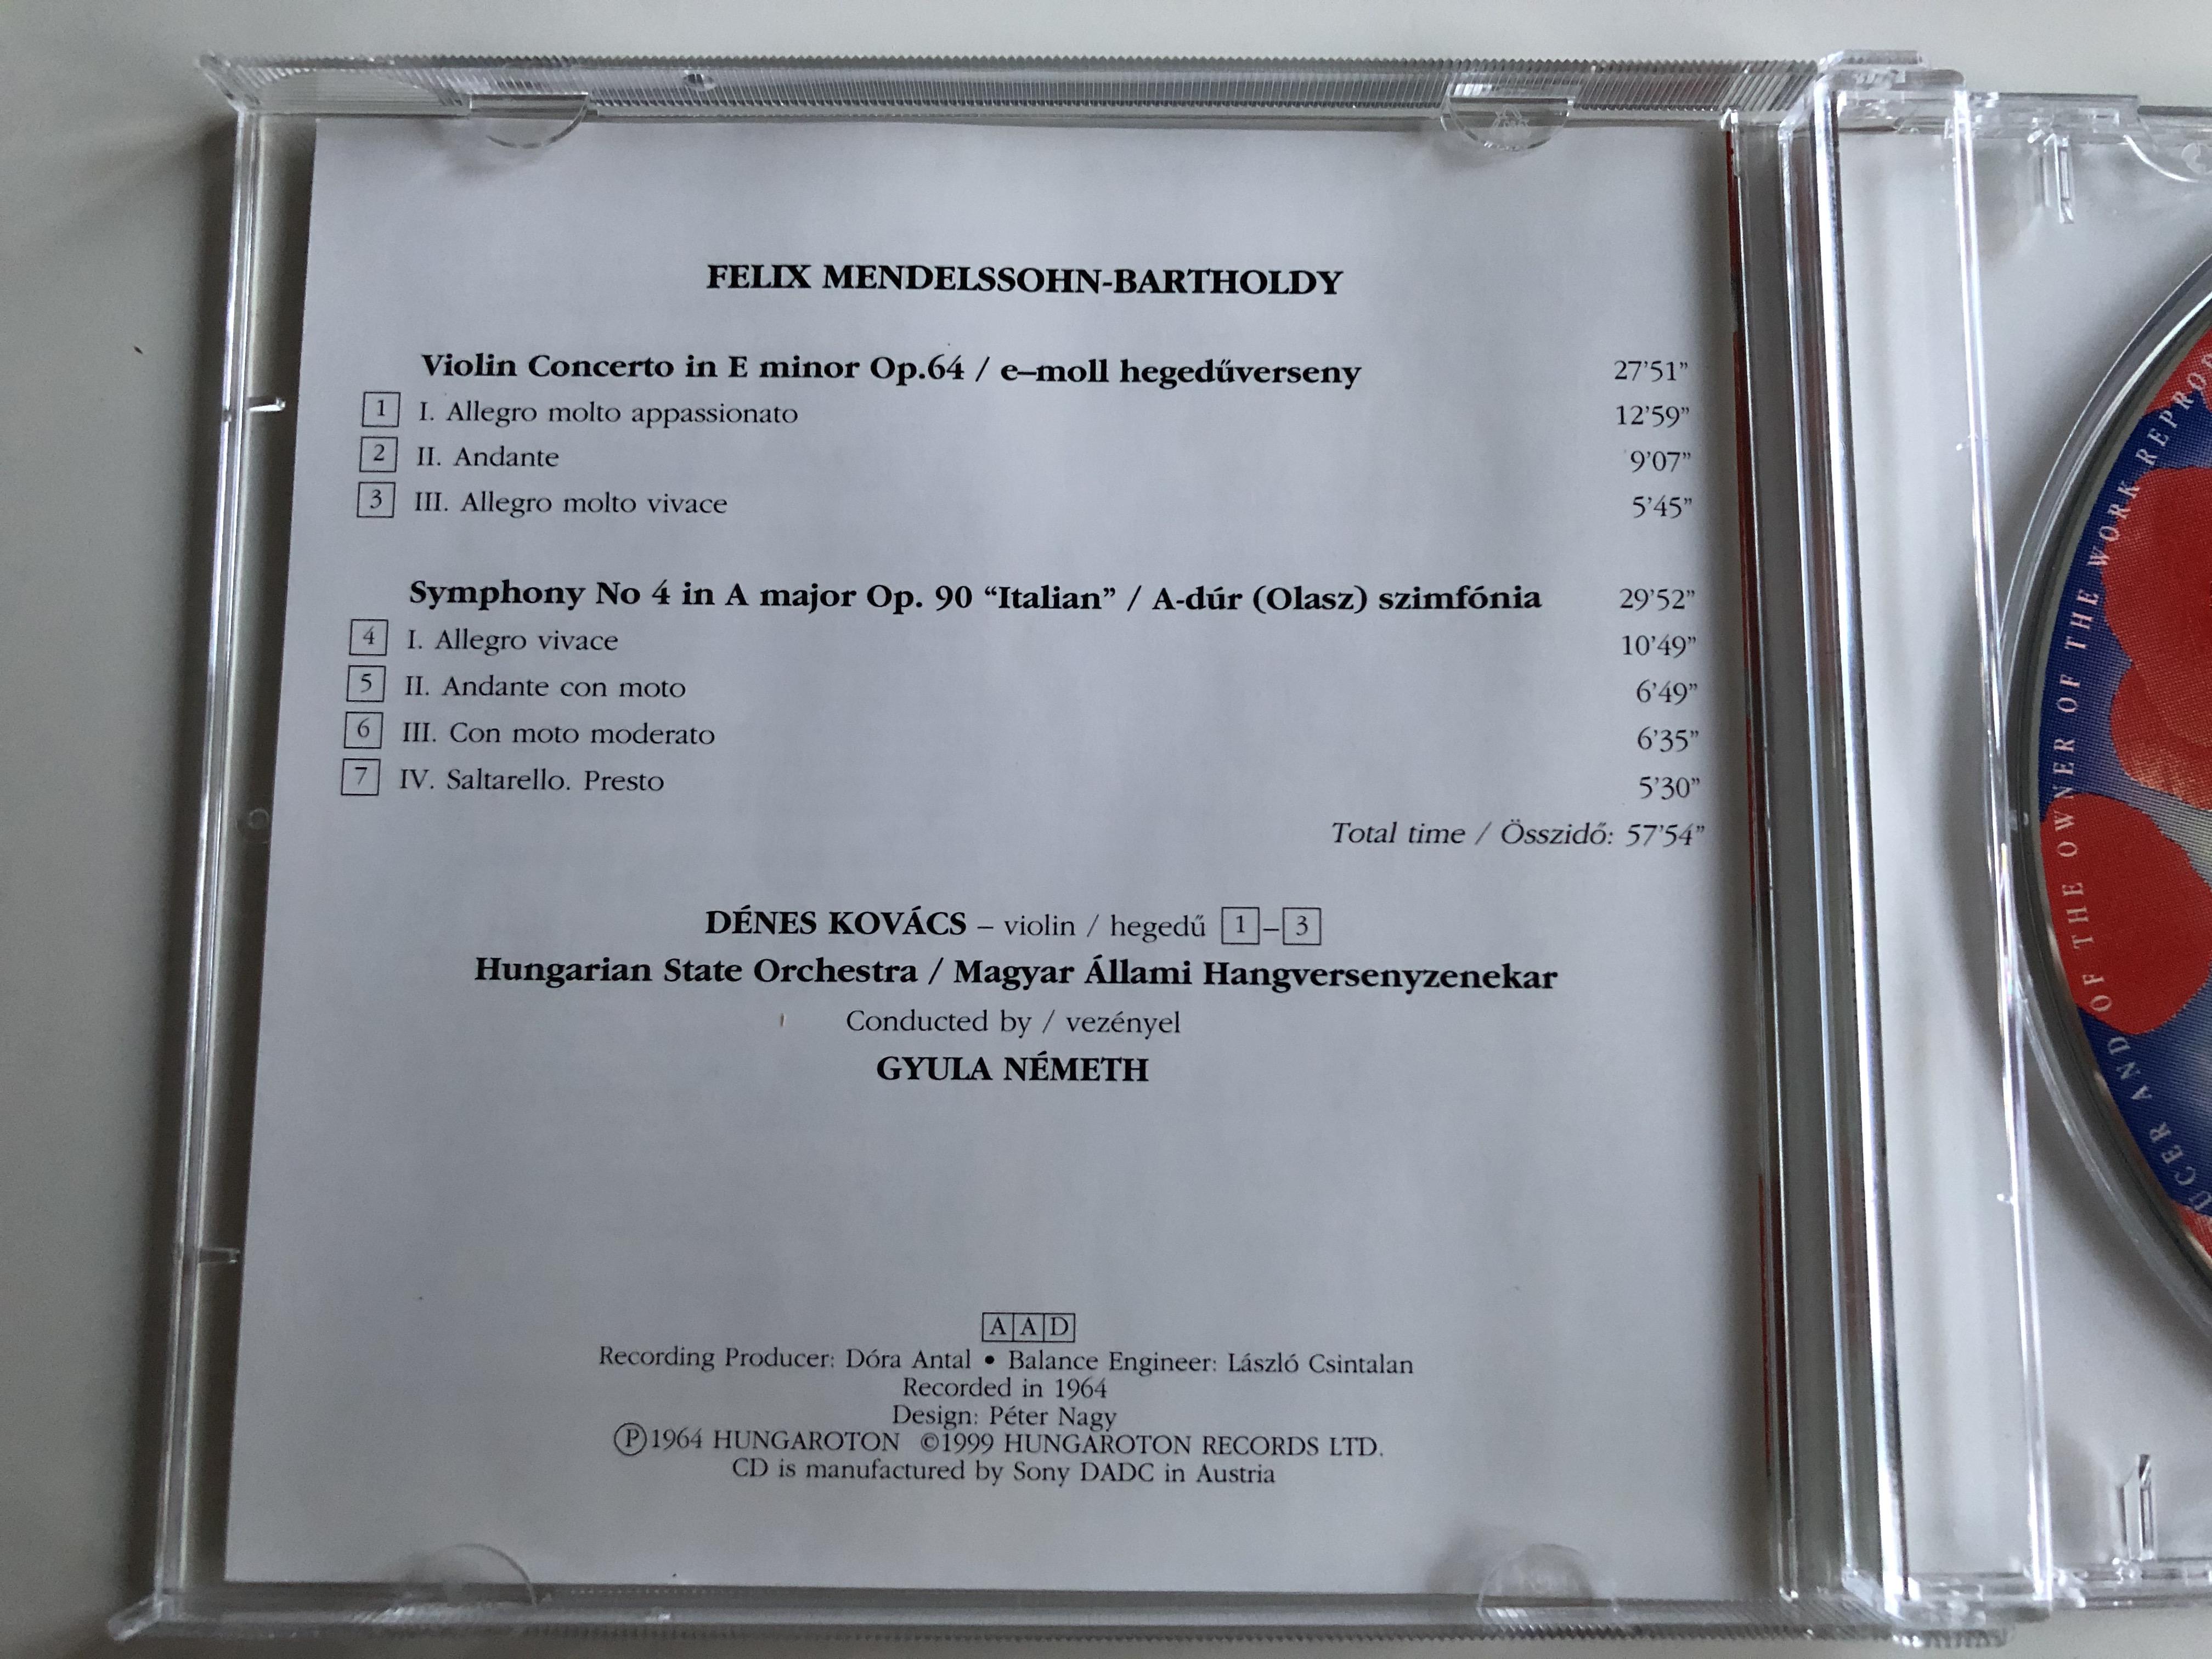 mendelssohn-symphony-no.4-italian-violin-concerto-d-nes-kov-cs-hungarian-state-orchestra-gyula-n-meth-hungaroton-classic-audio-cd-1964-stereo-hrc-1029-2-.jpg